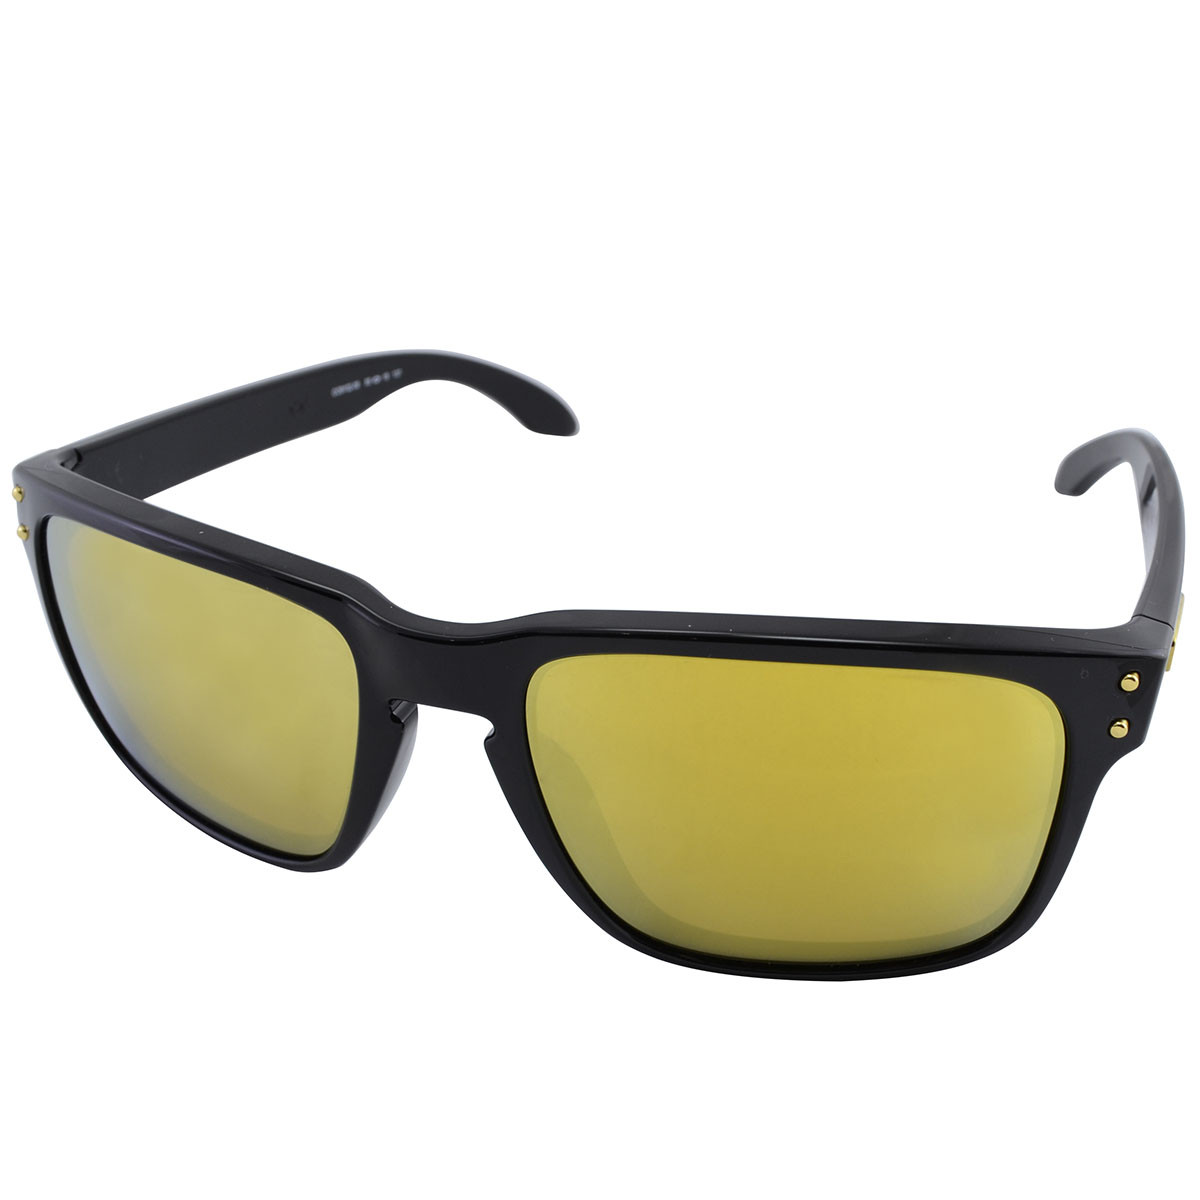 Óculos Oakley Holbrook Shaun White Gold Signature Polished Black ... abaf5a9ac3